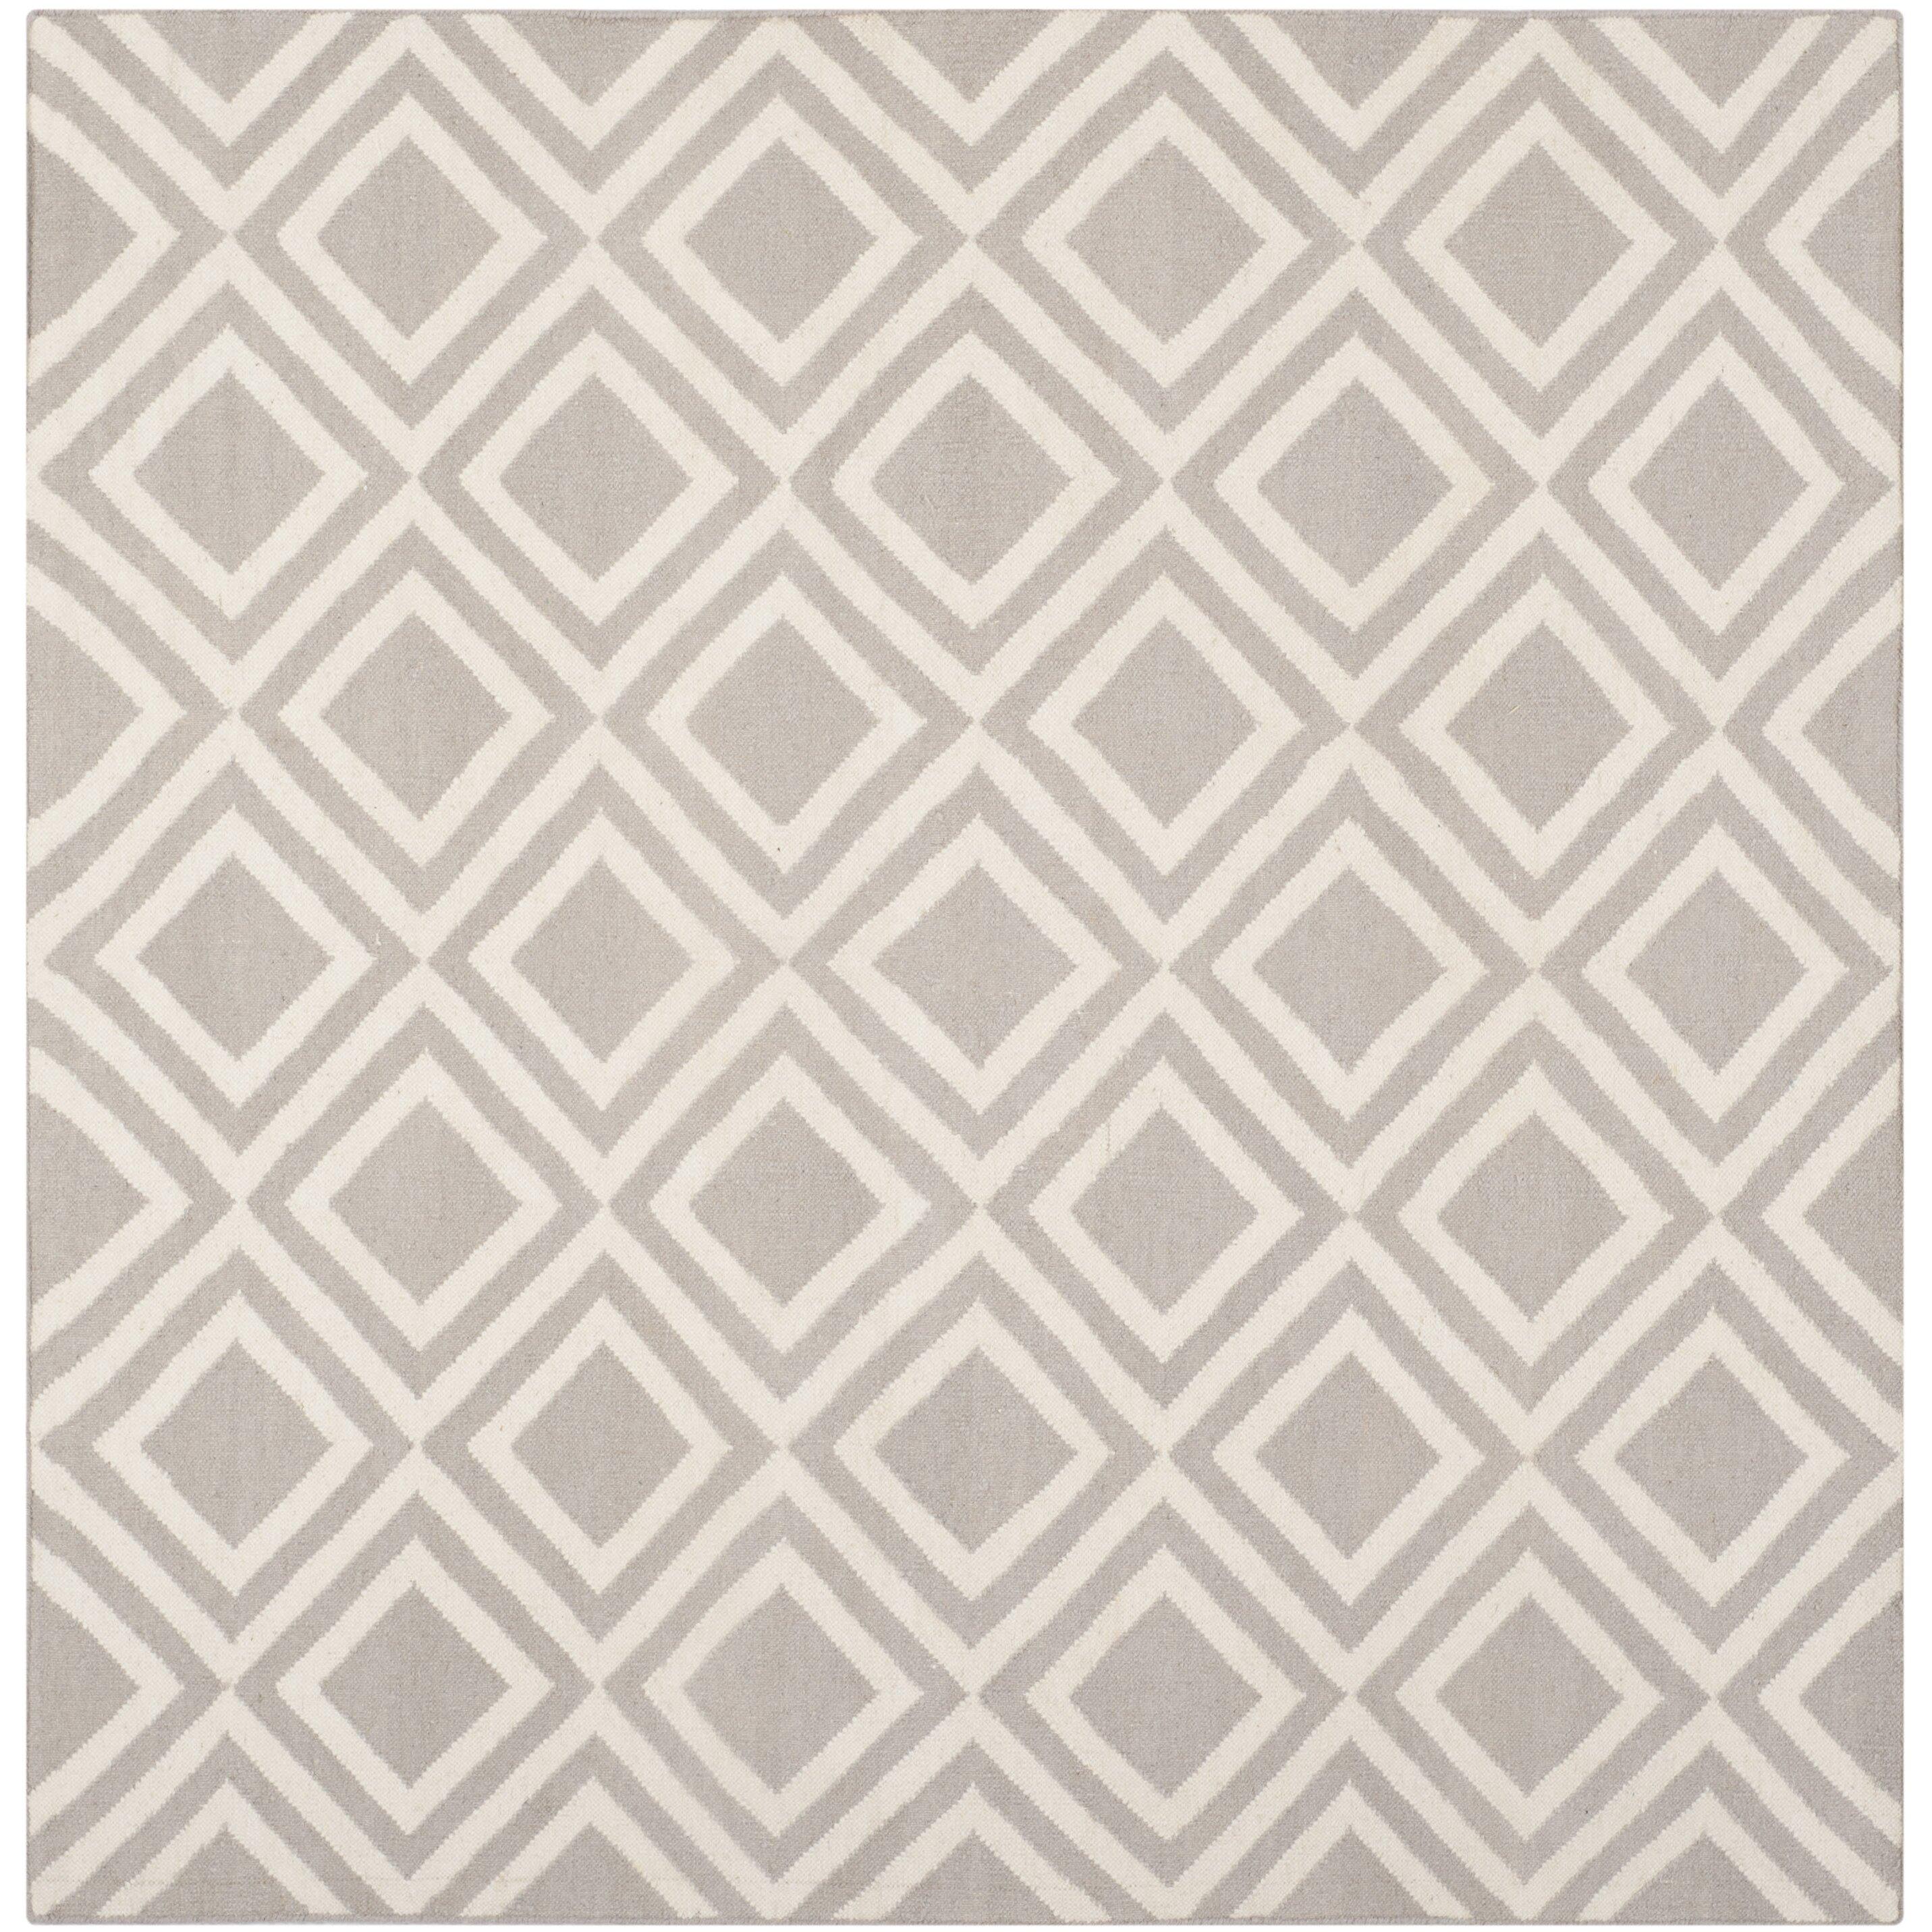 Latitude run brianna grey ivory area rug reviews wayfair for Carrelage metro noir mat